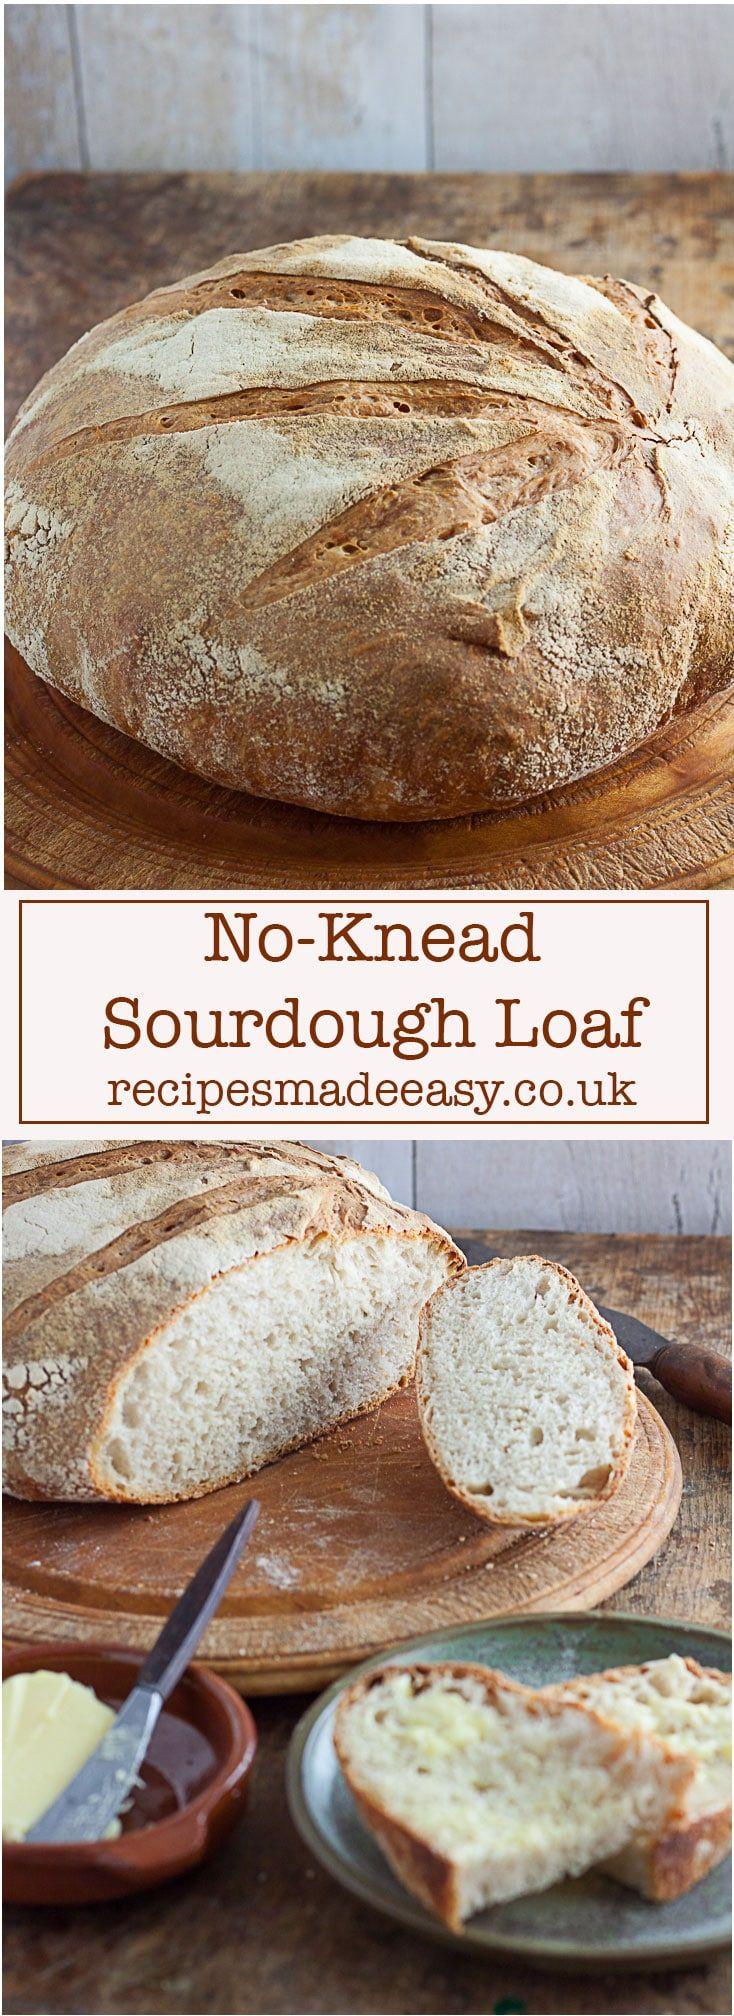 NoKnead Sourdough Loaf Recipe Easy bread recipes